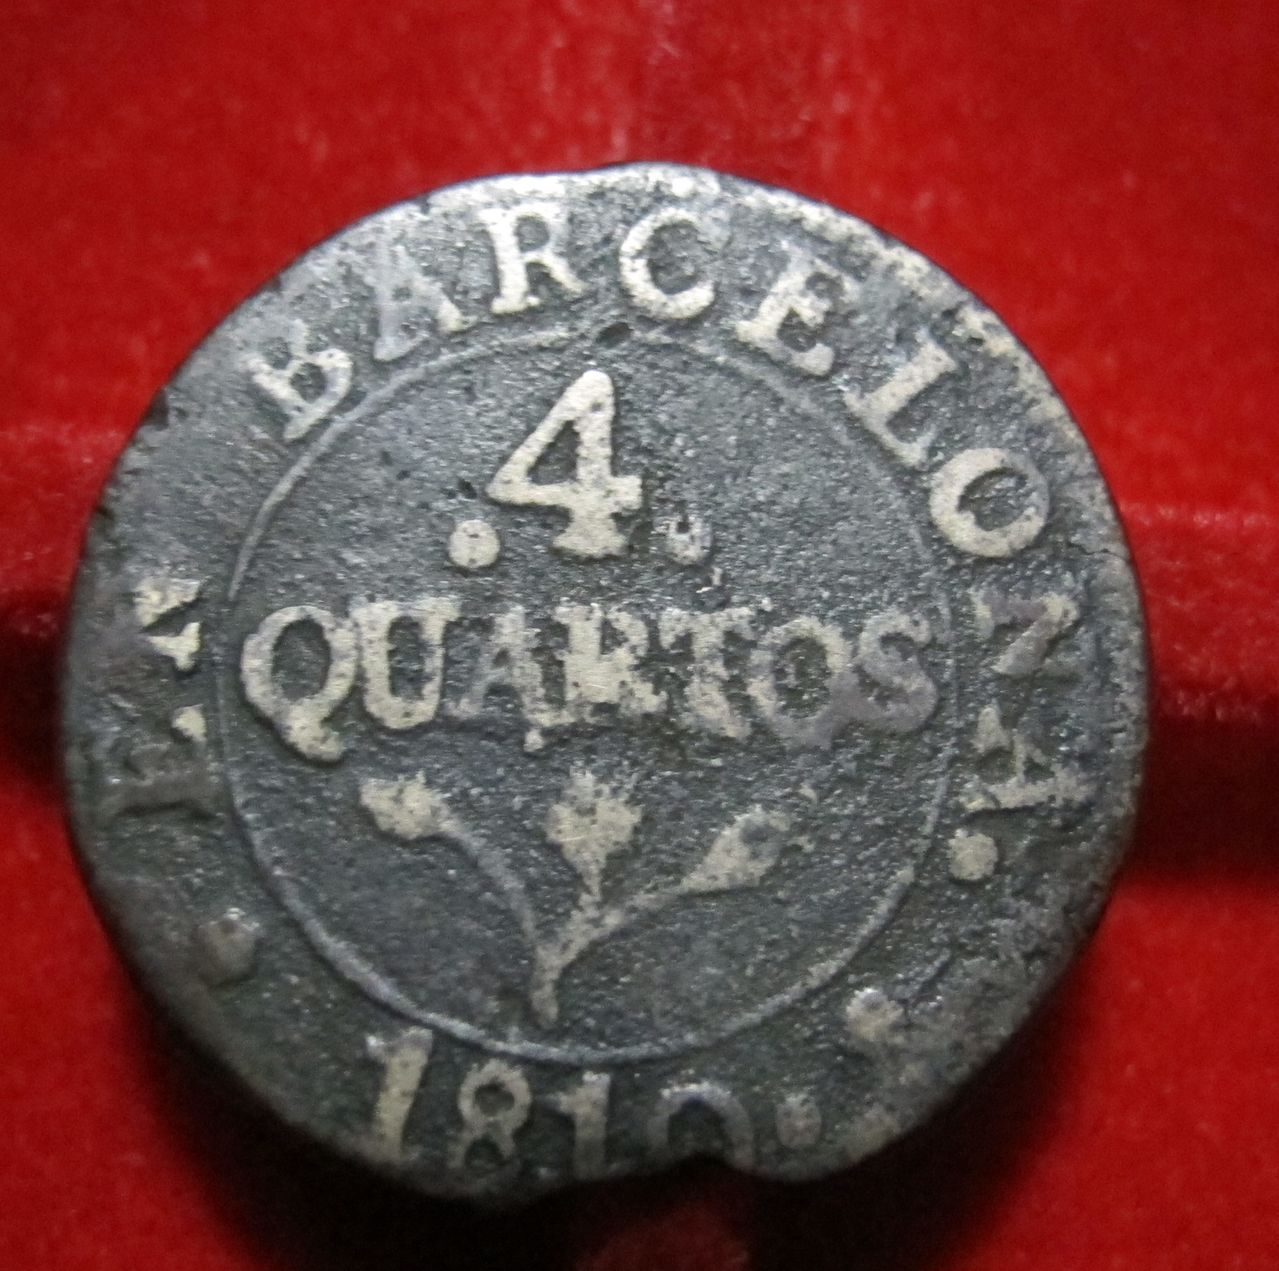 4 Quartos de 1810 (FUNDIDA). José Napoleón. Barcelona. 4quar1810